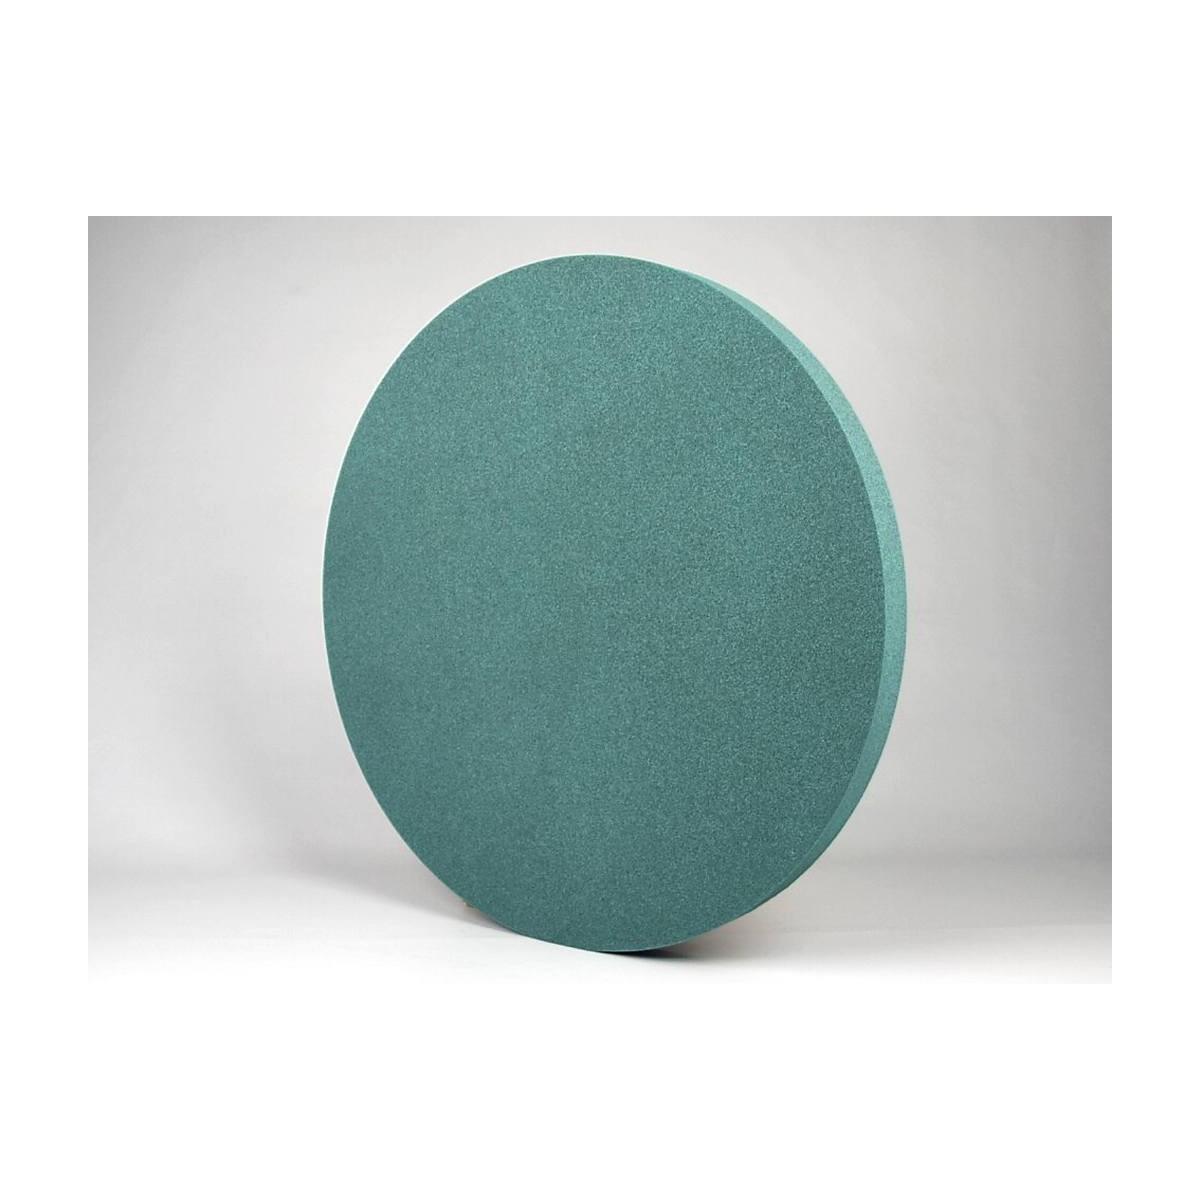 Panel Acustico EliAcoustic CIrcle Turquoise para reducir ruido y reverberacion